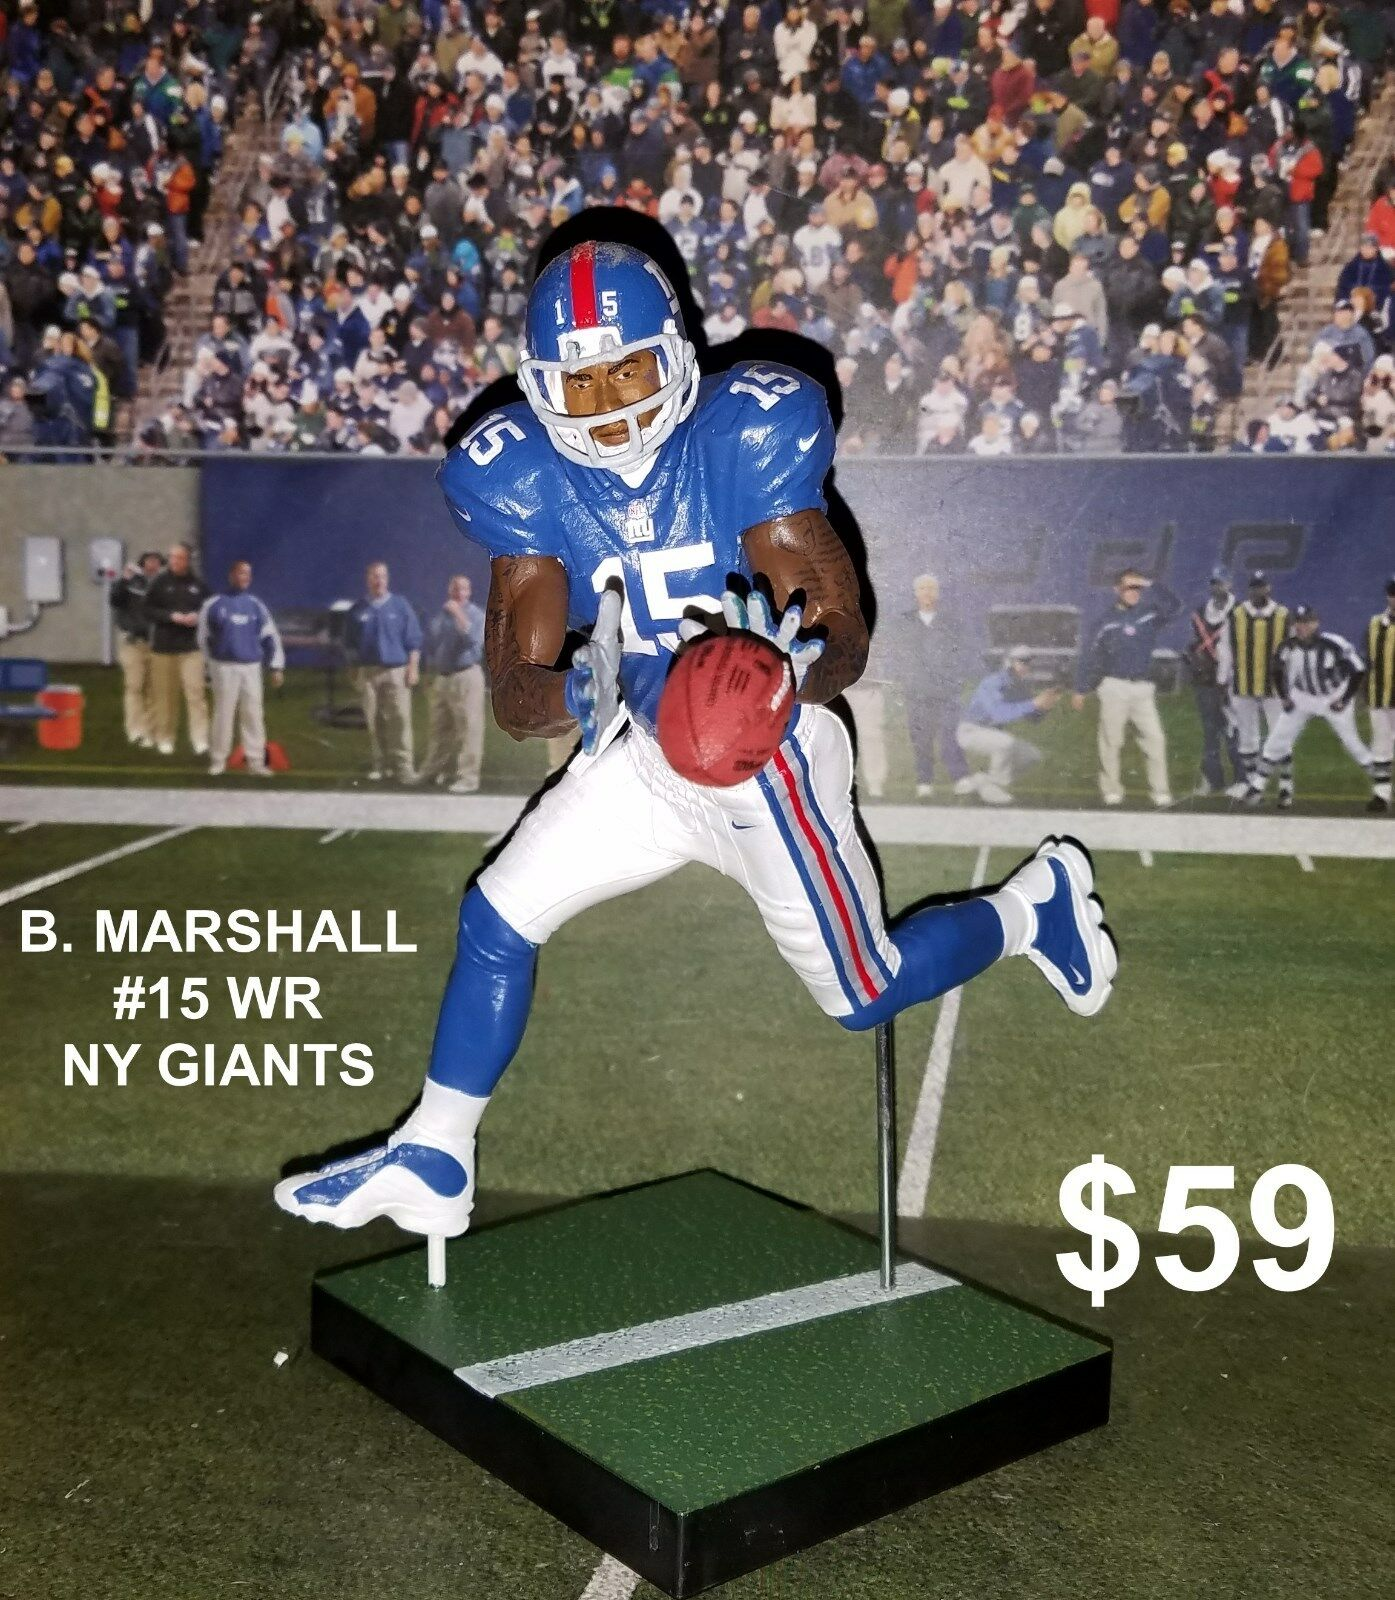 Custom B. Marshall  15 WR NY Giants Mcfarlane figure